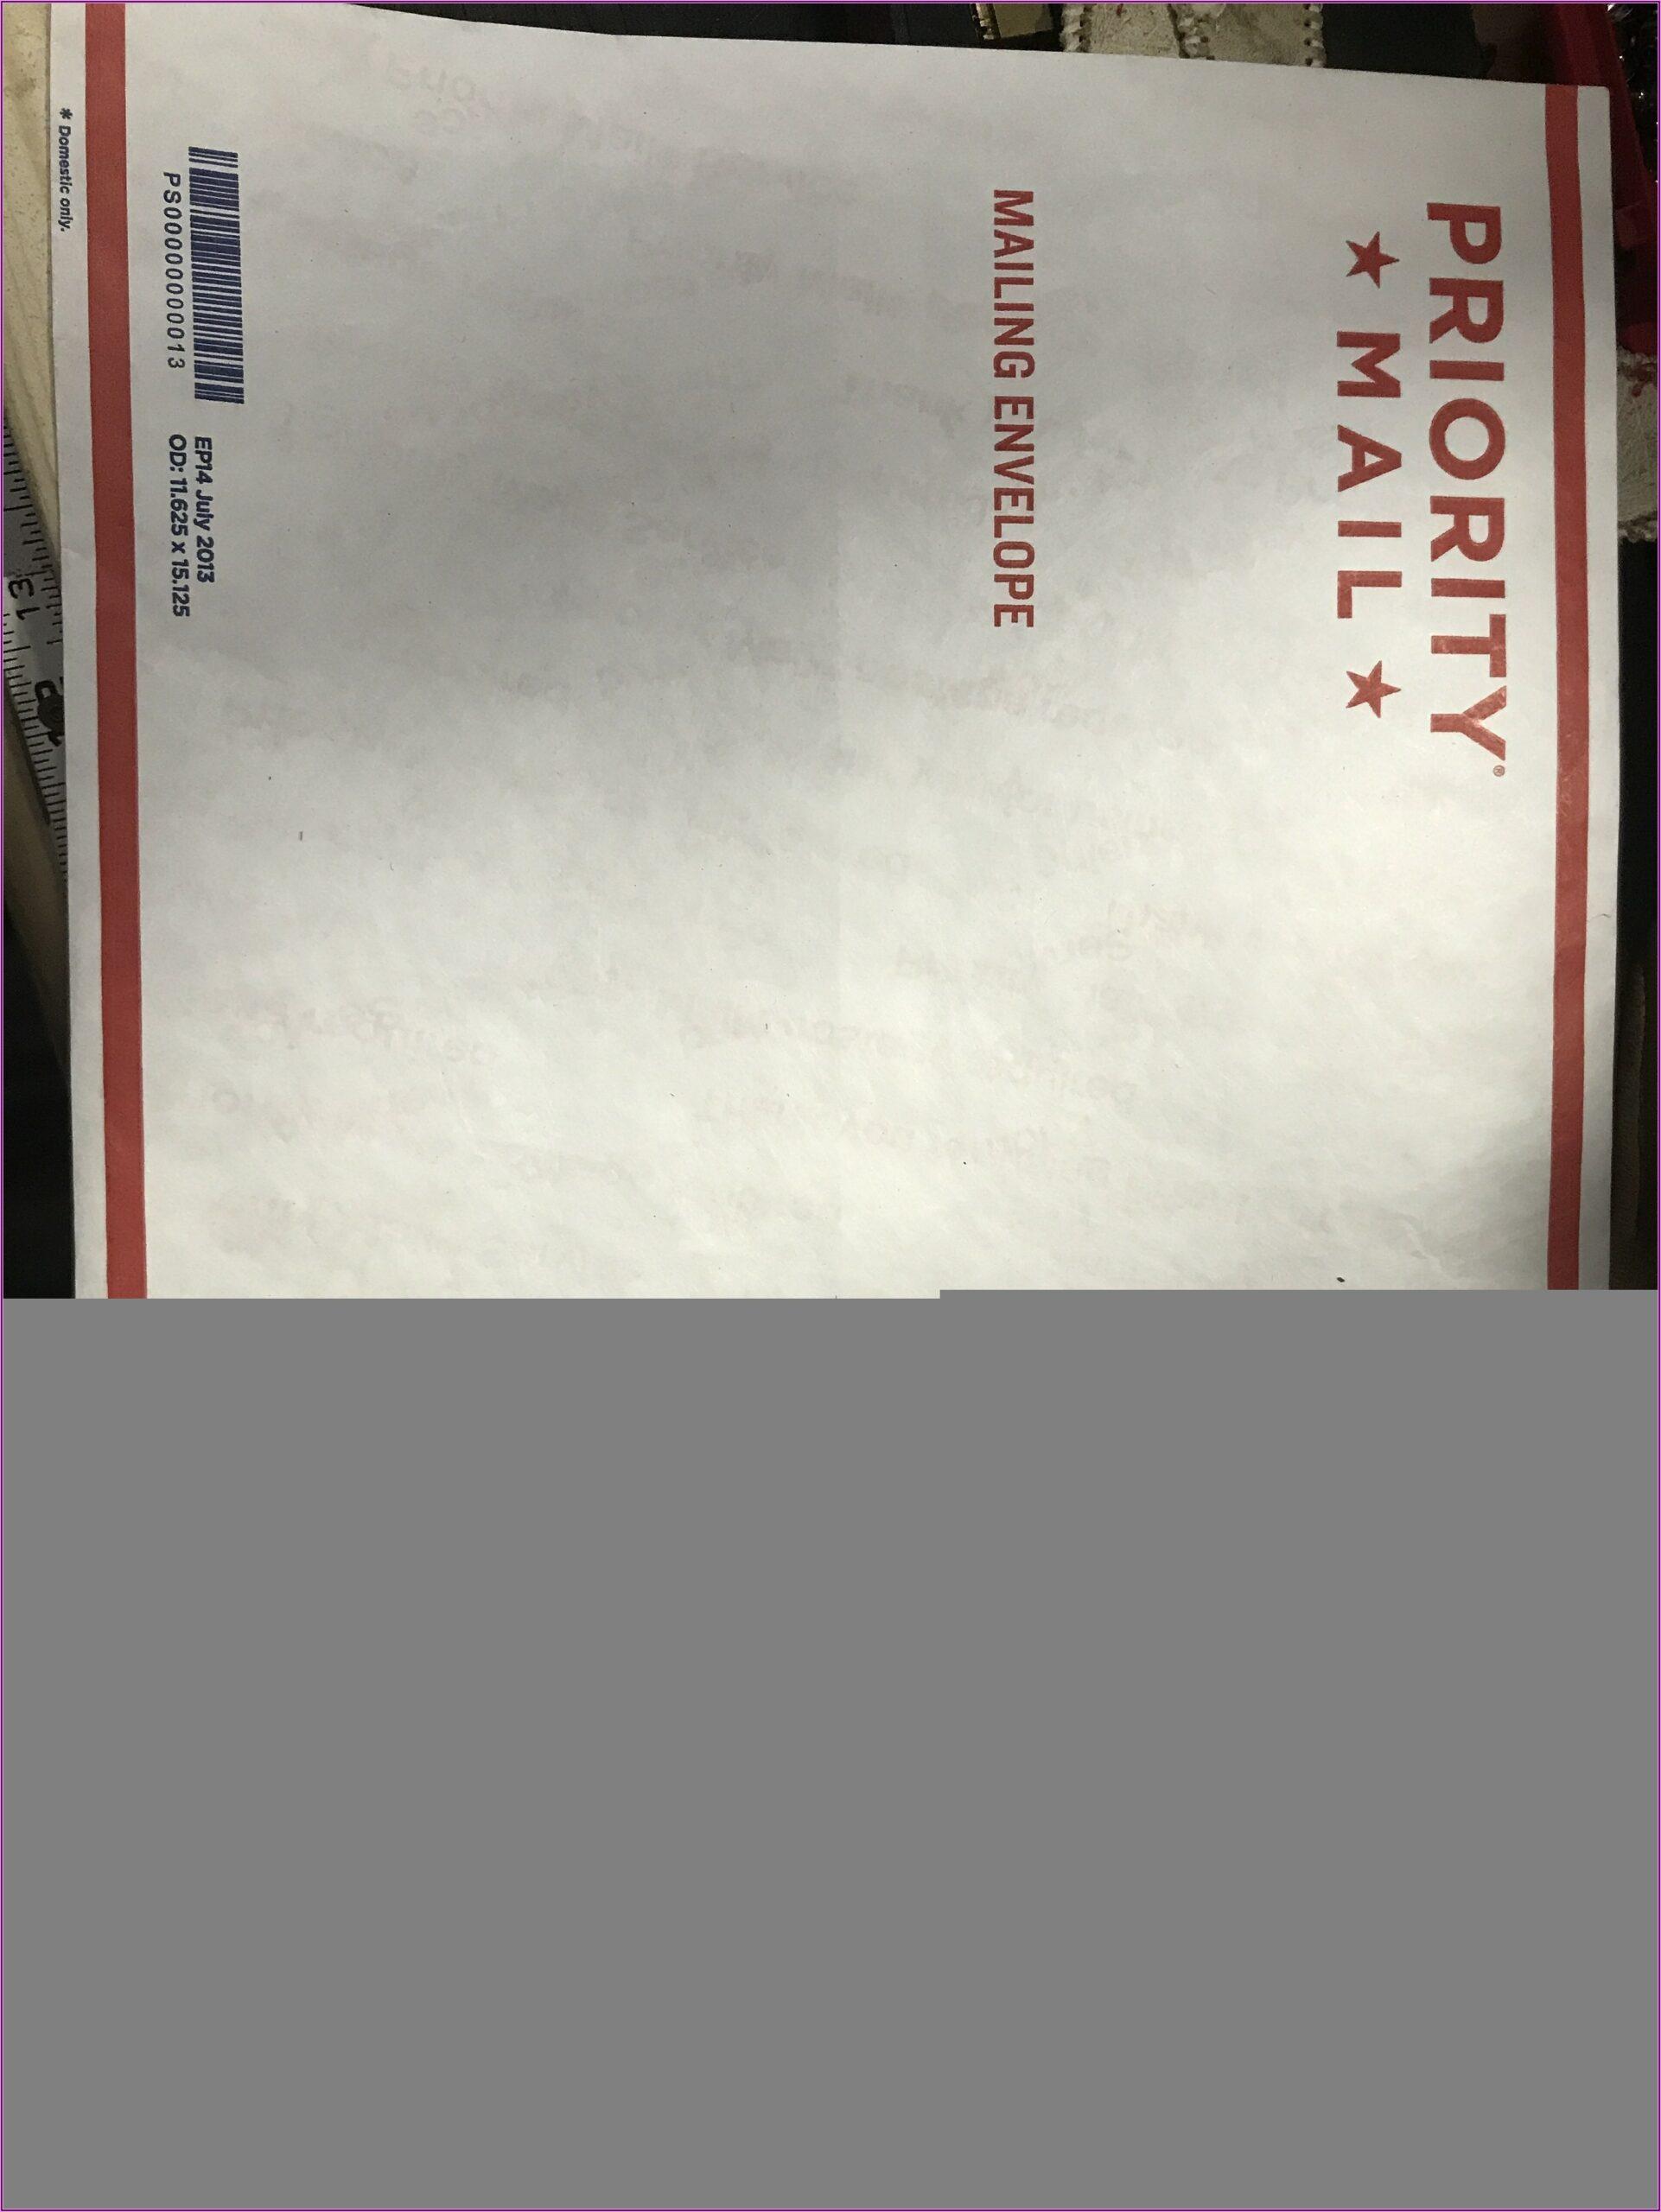 Us Postal Service Padded Envelope Rates